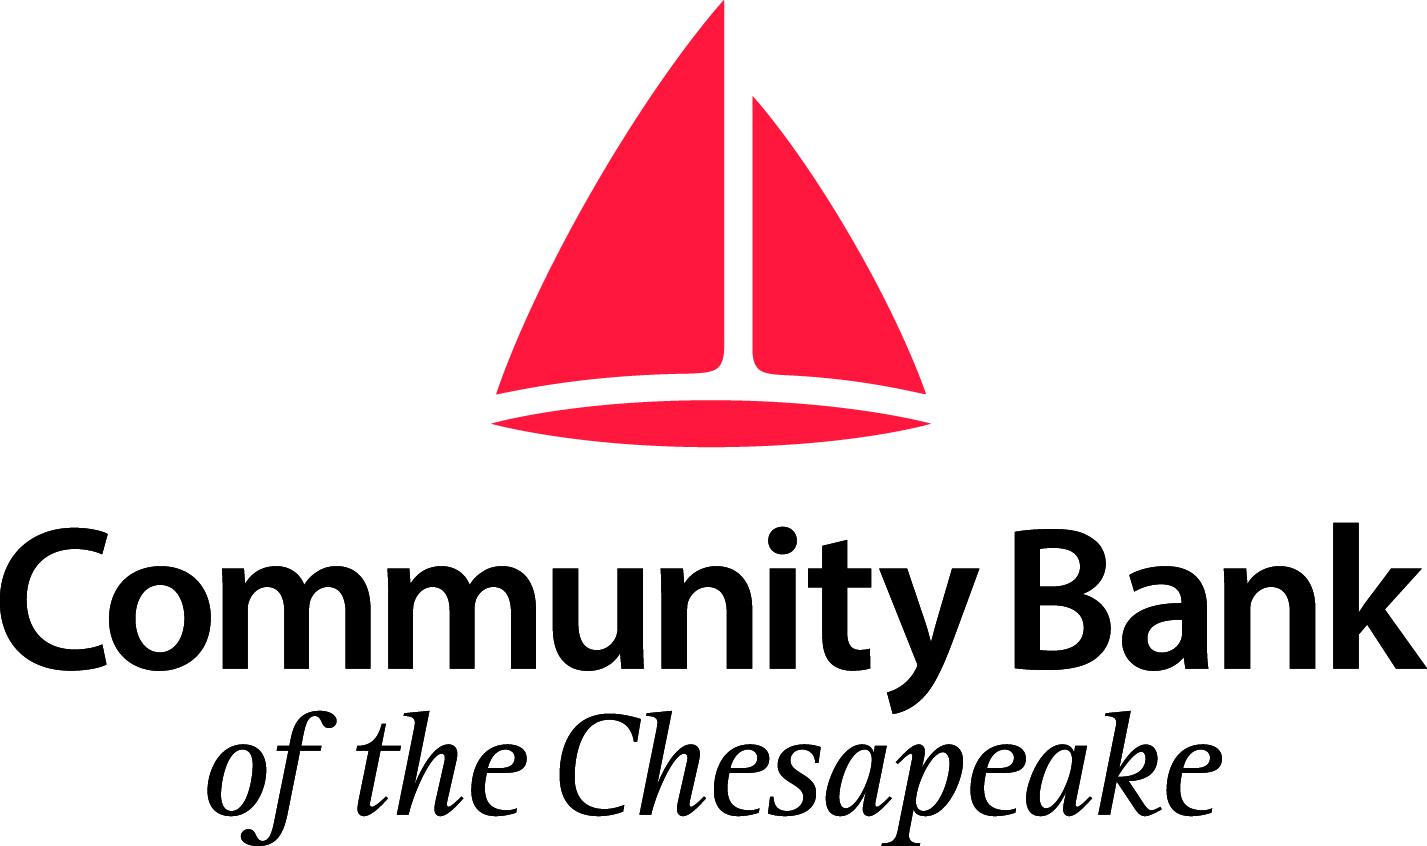 Community Bank logo